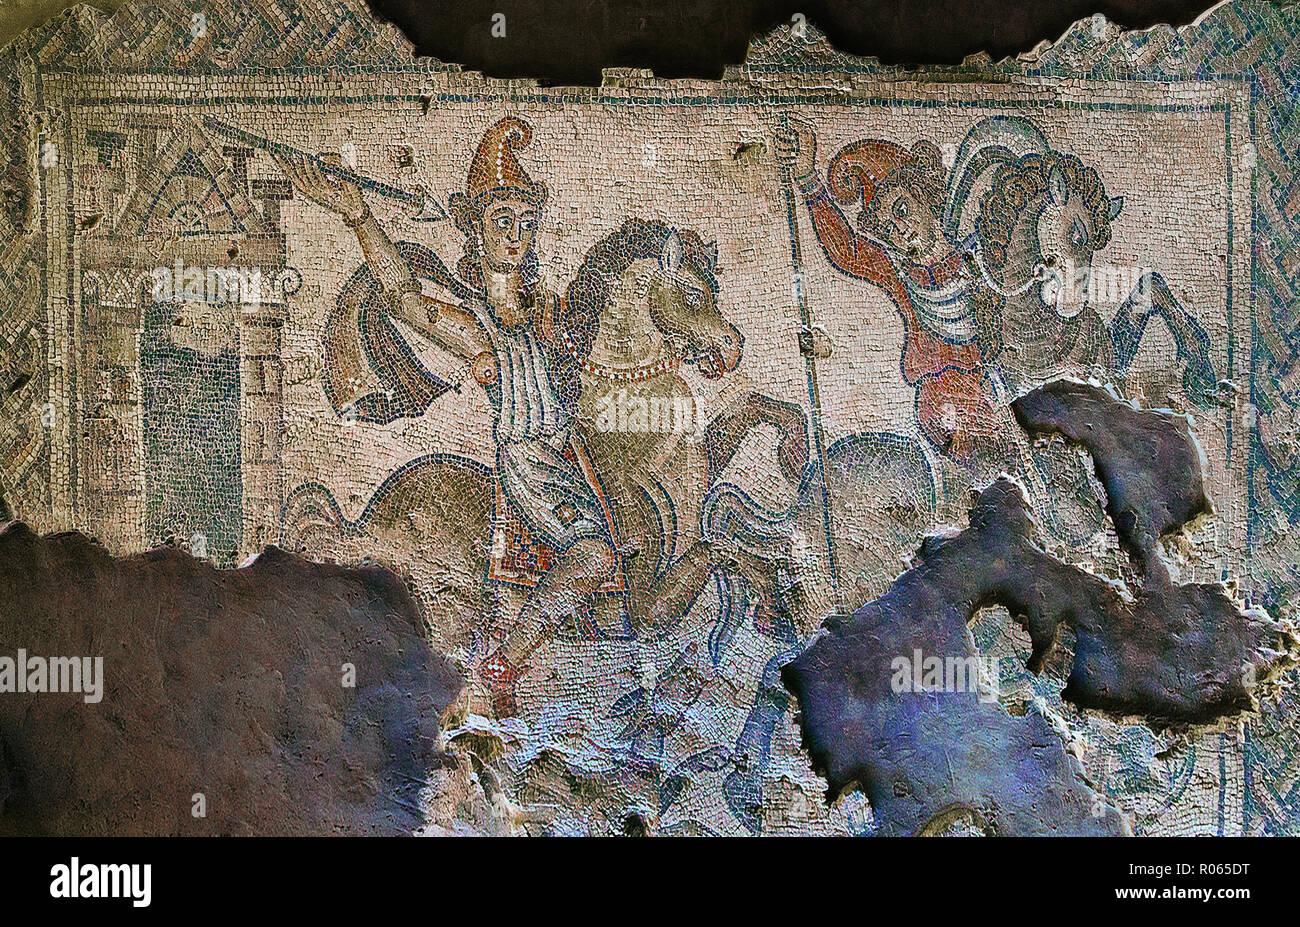 6363. Sepphoris mosaic, late Roman depicting a hunting scene. Stock Photo